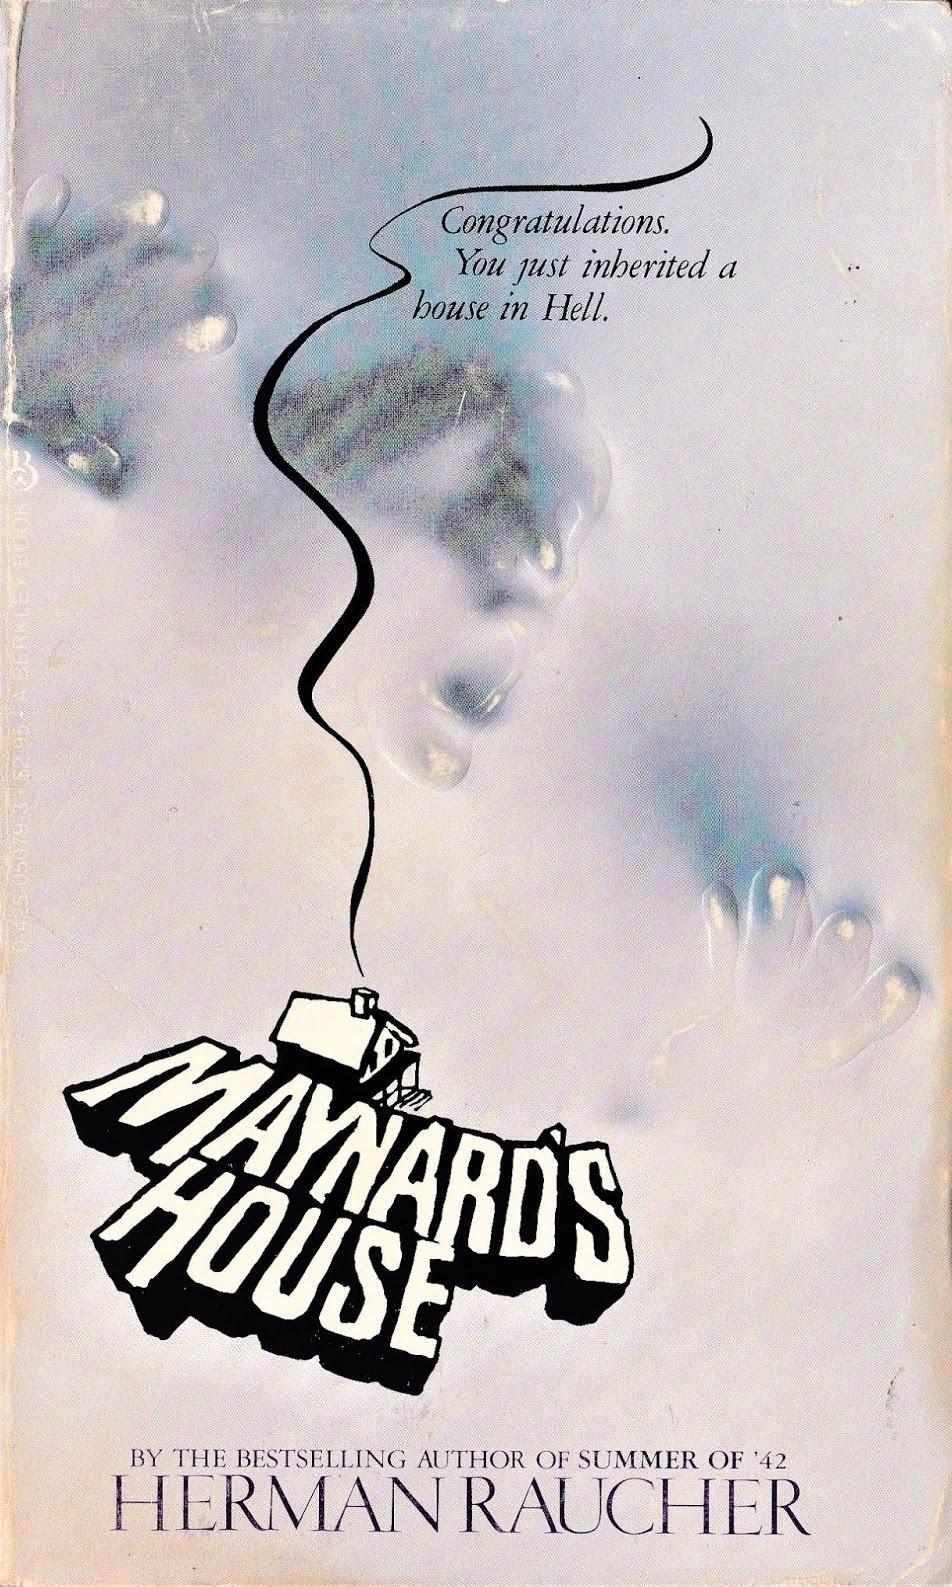 Maynard's House - Herman Raucher - Berkley - Sept 1981